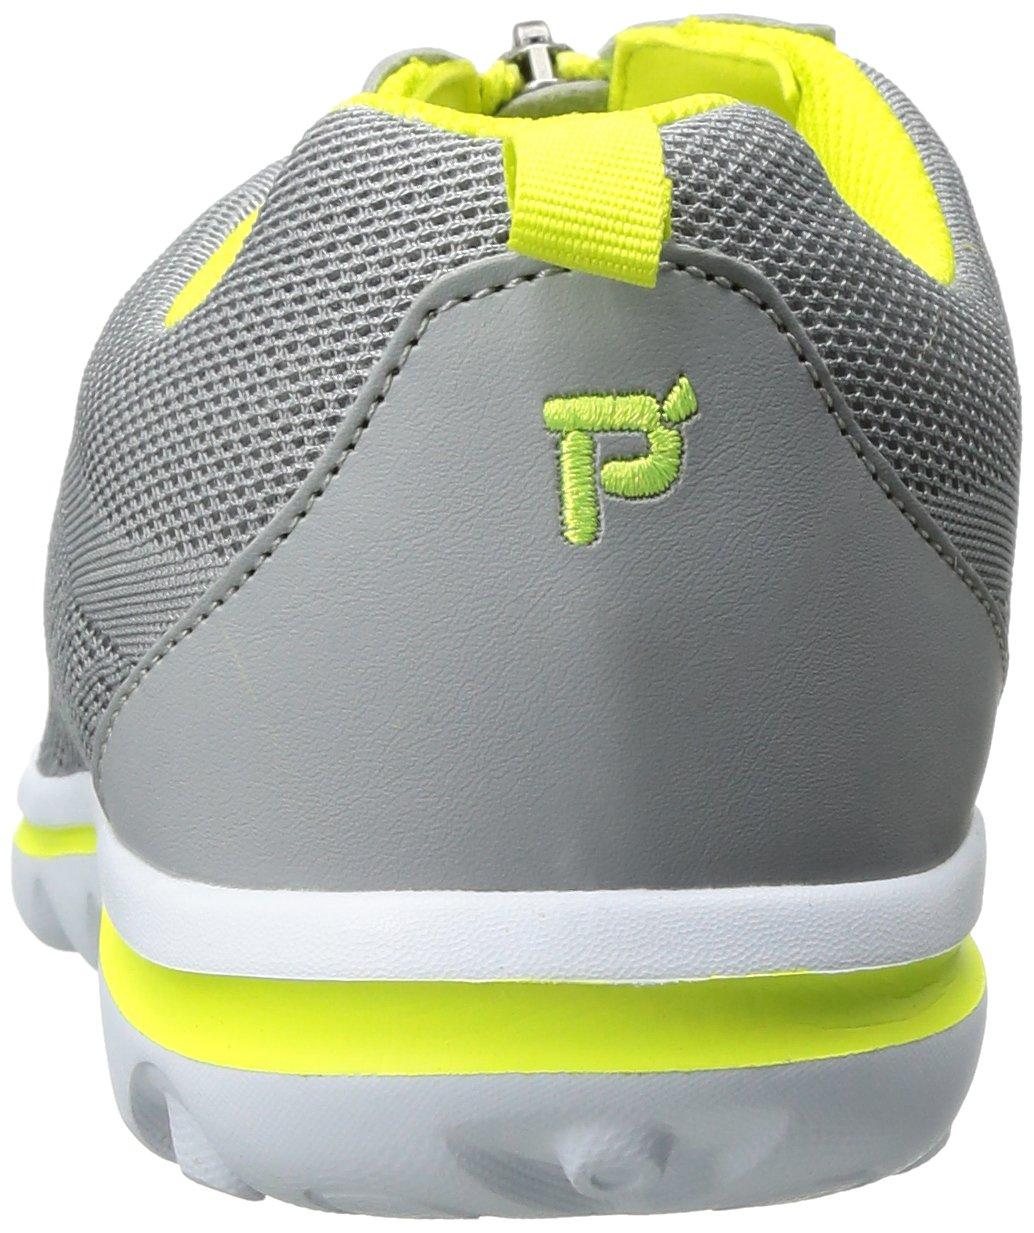 Propet Women's TravelActiv Zip Walking Shoe B01IODD7IG 7 4E US|Silver/Lime